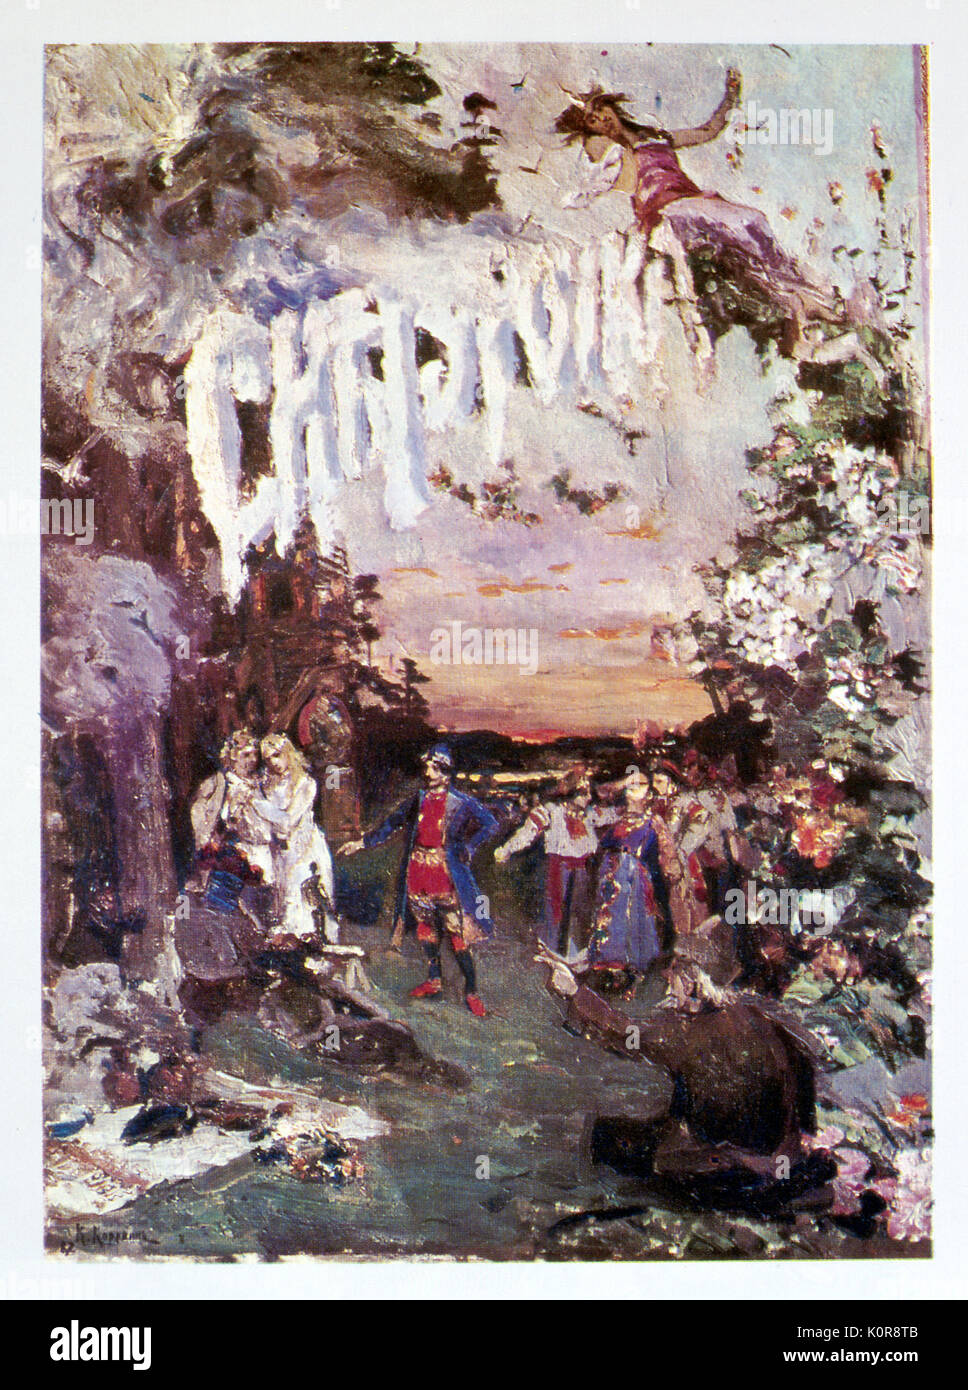 Who wrote the opera Khovanshchina